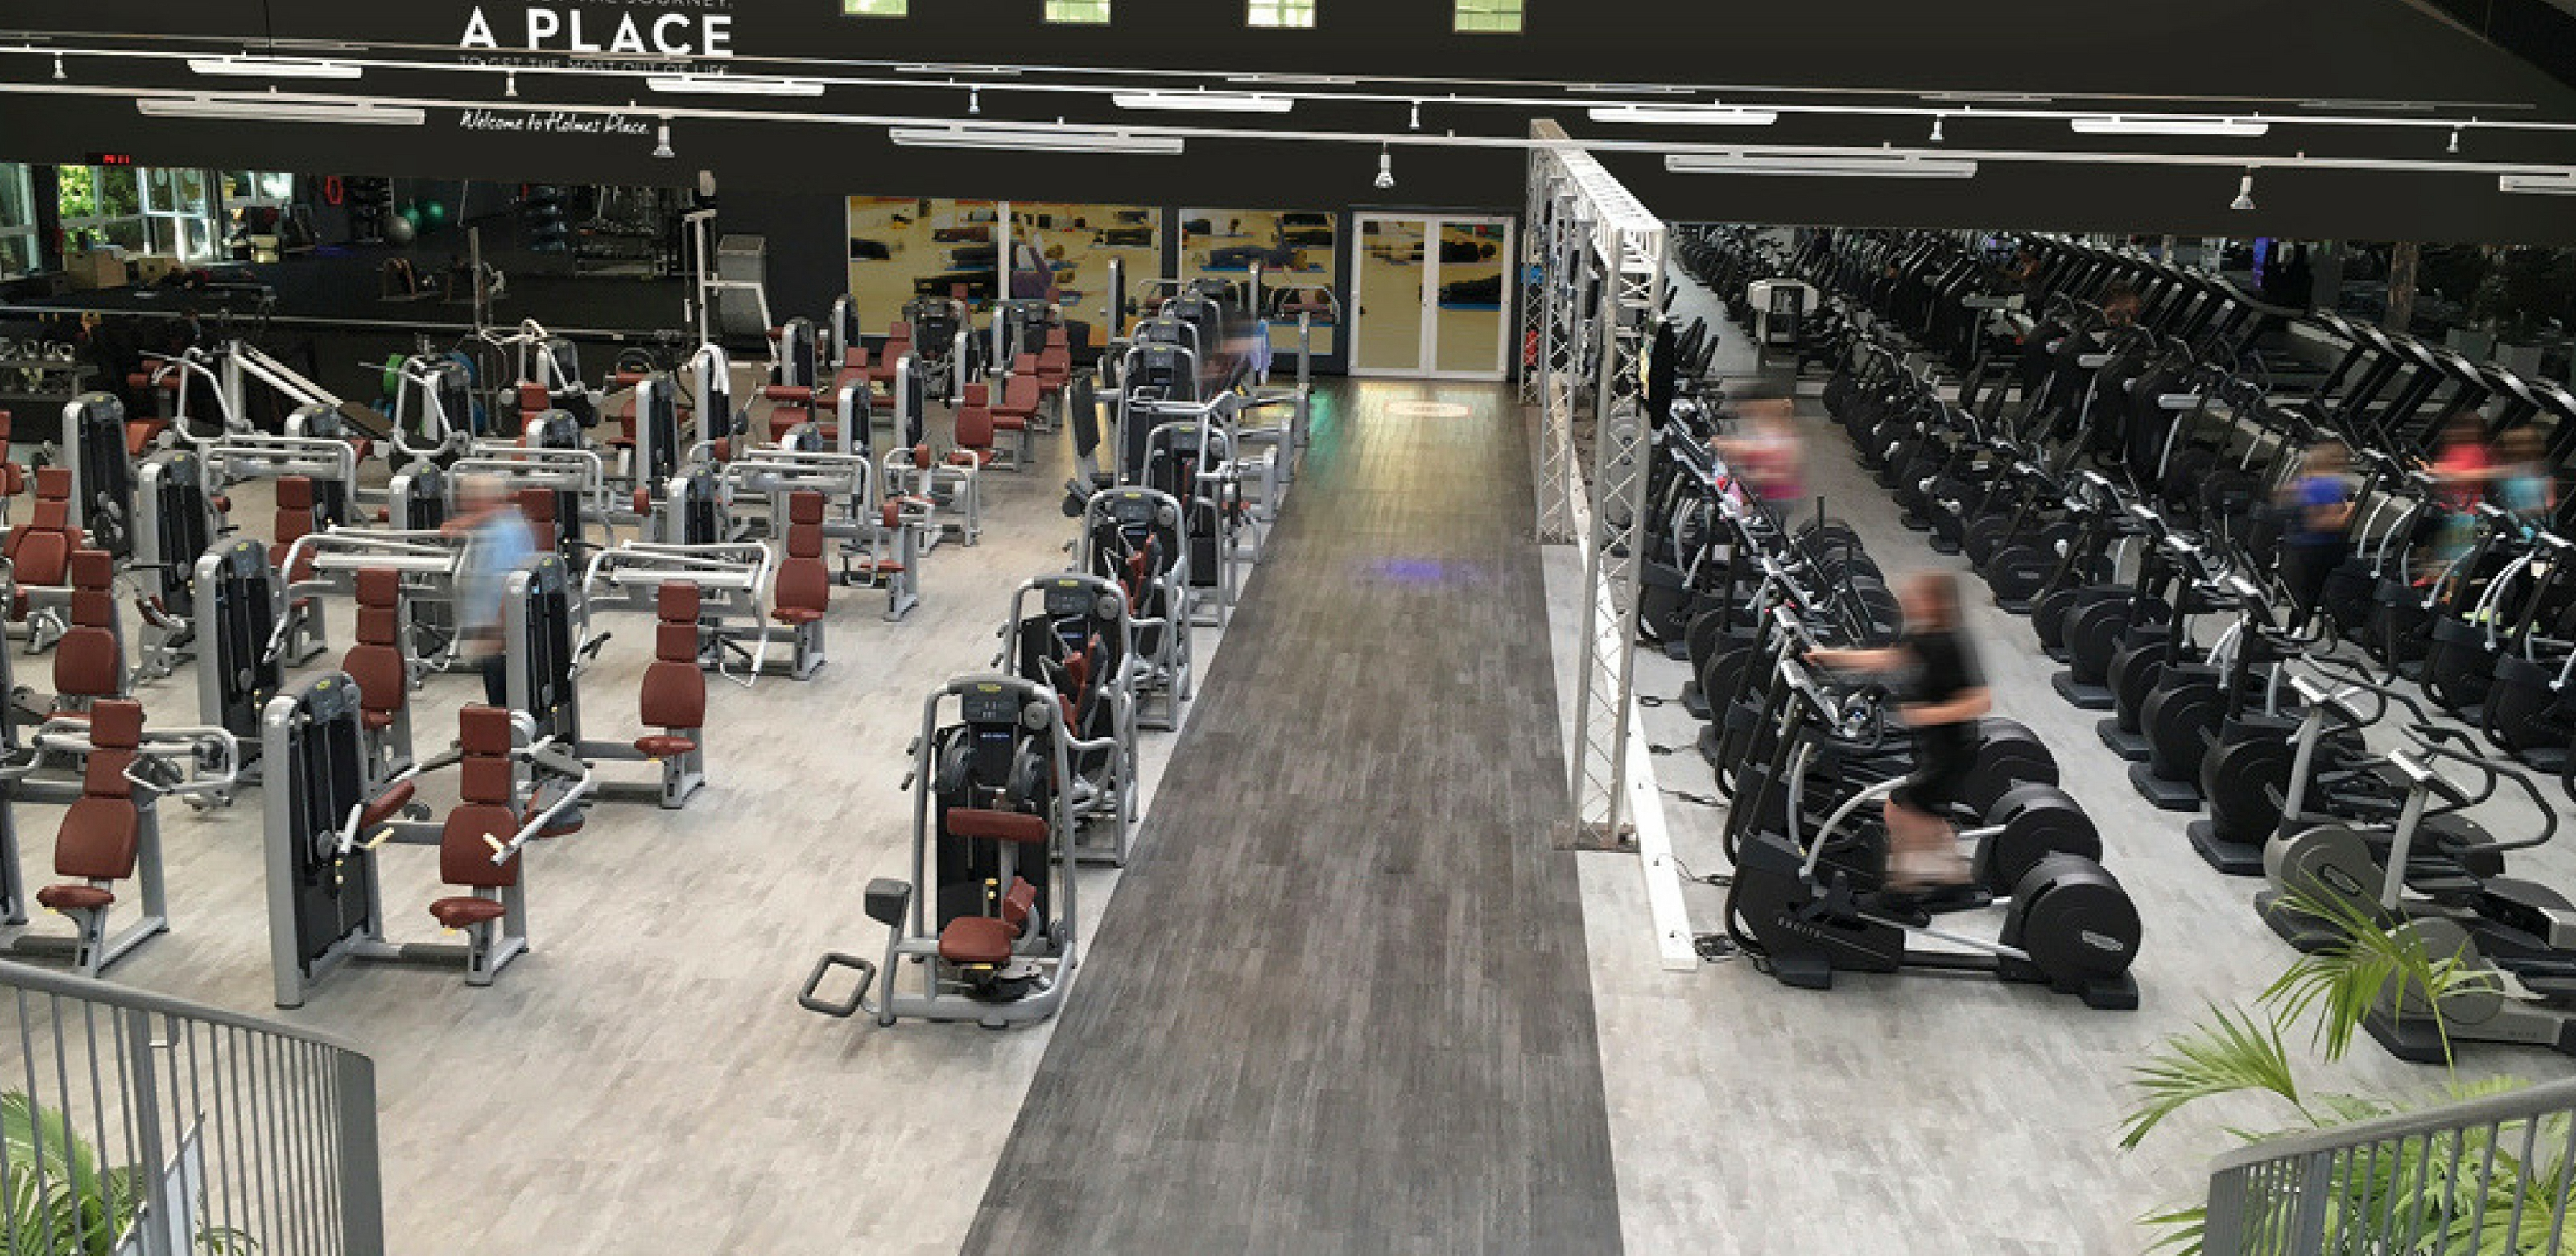 Fitnessstudio Oberkassel | Holmes Place Deutschland